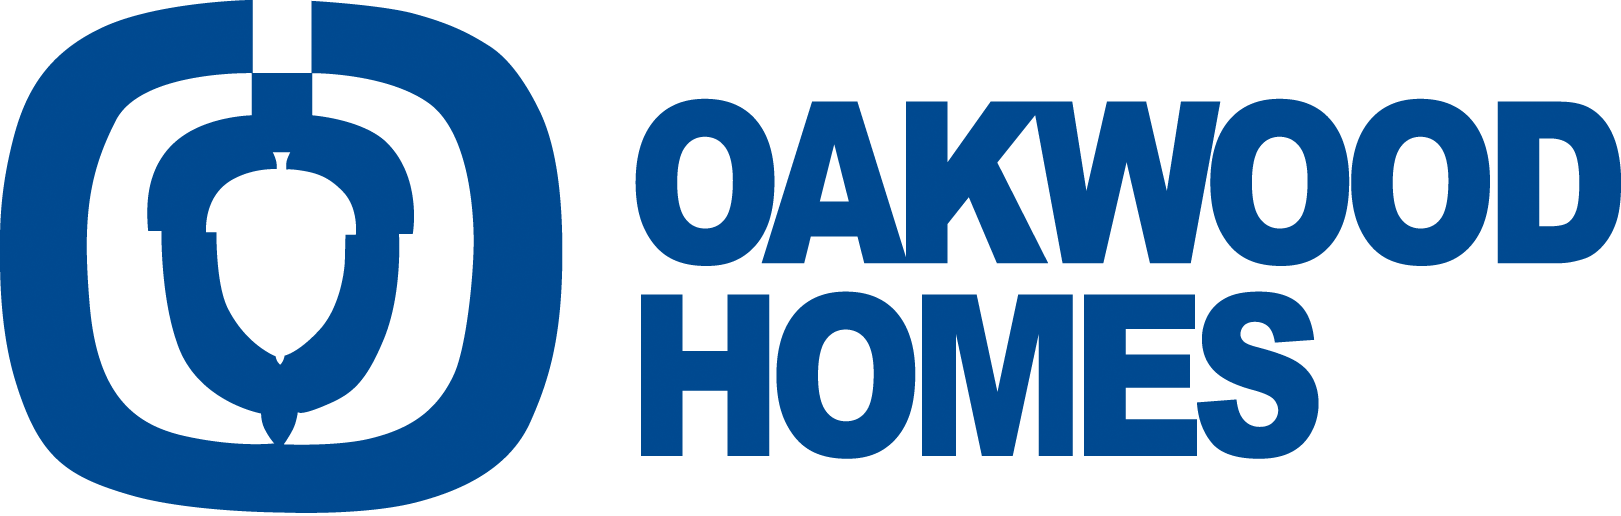 OakwoodHomes_horiz_RGB.png